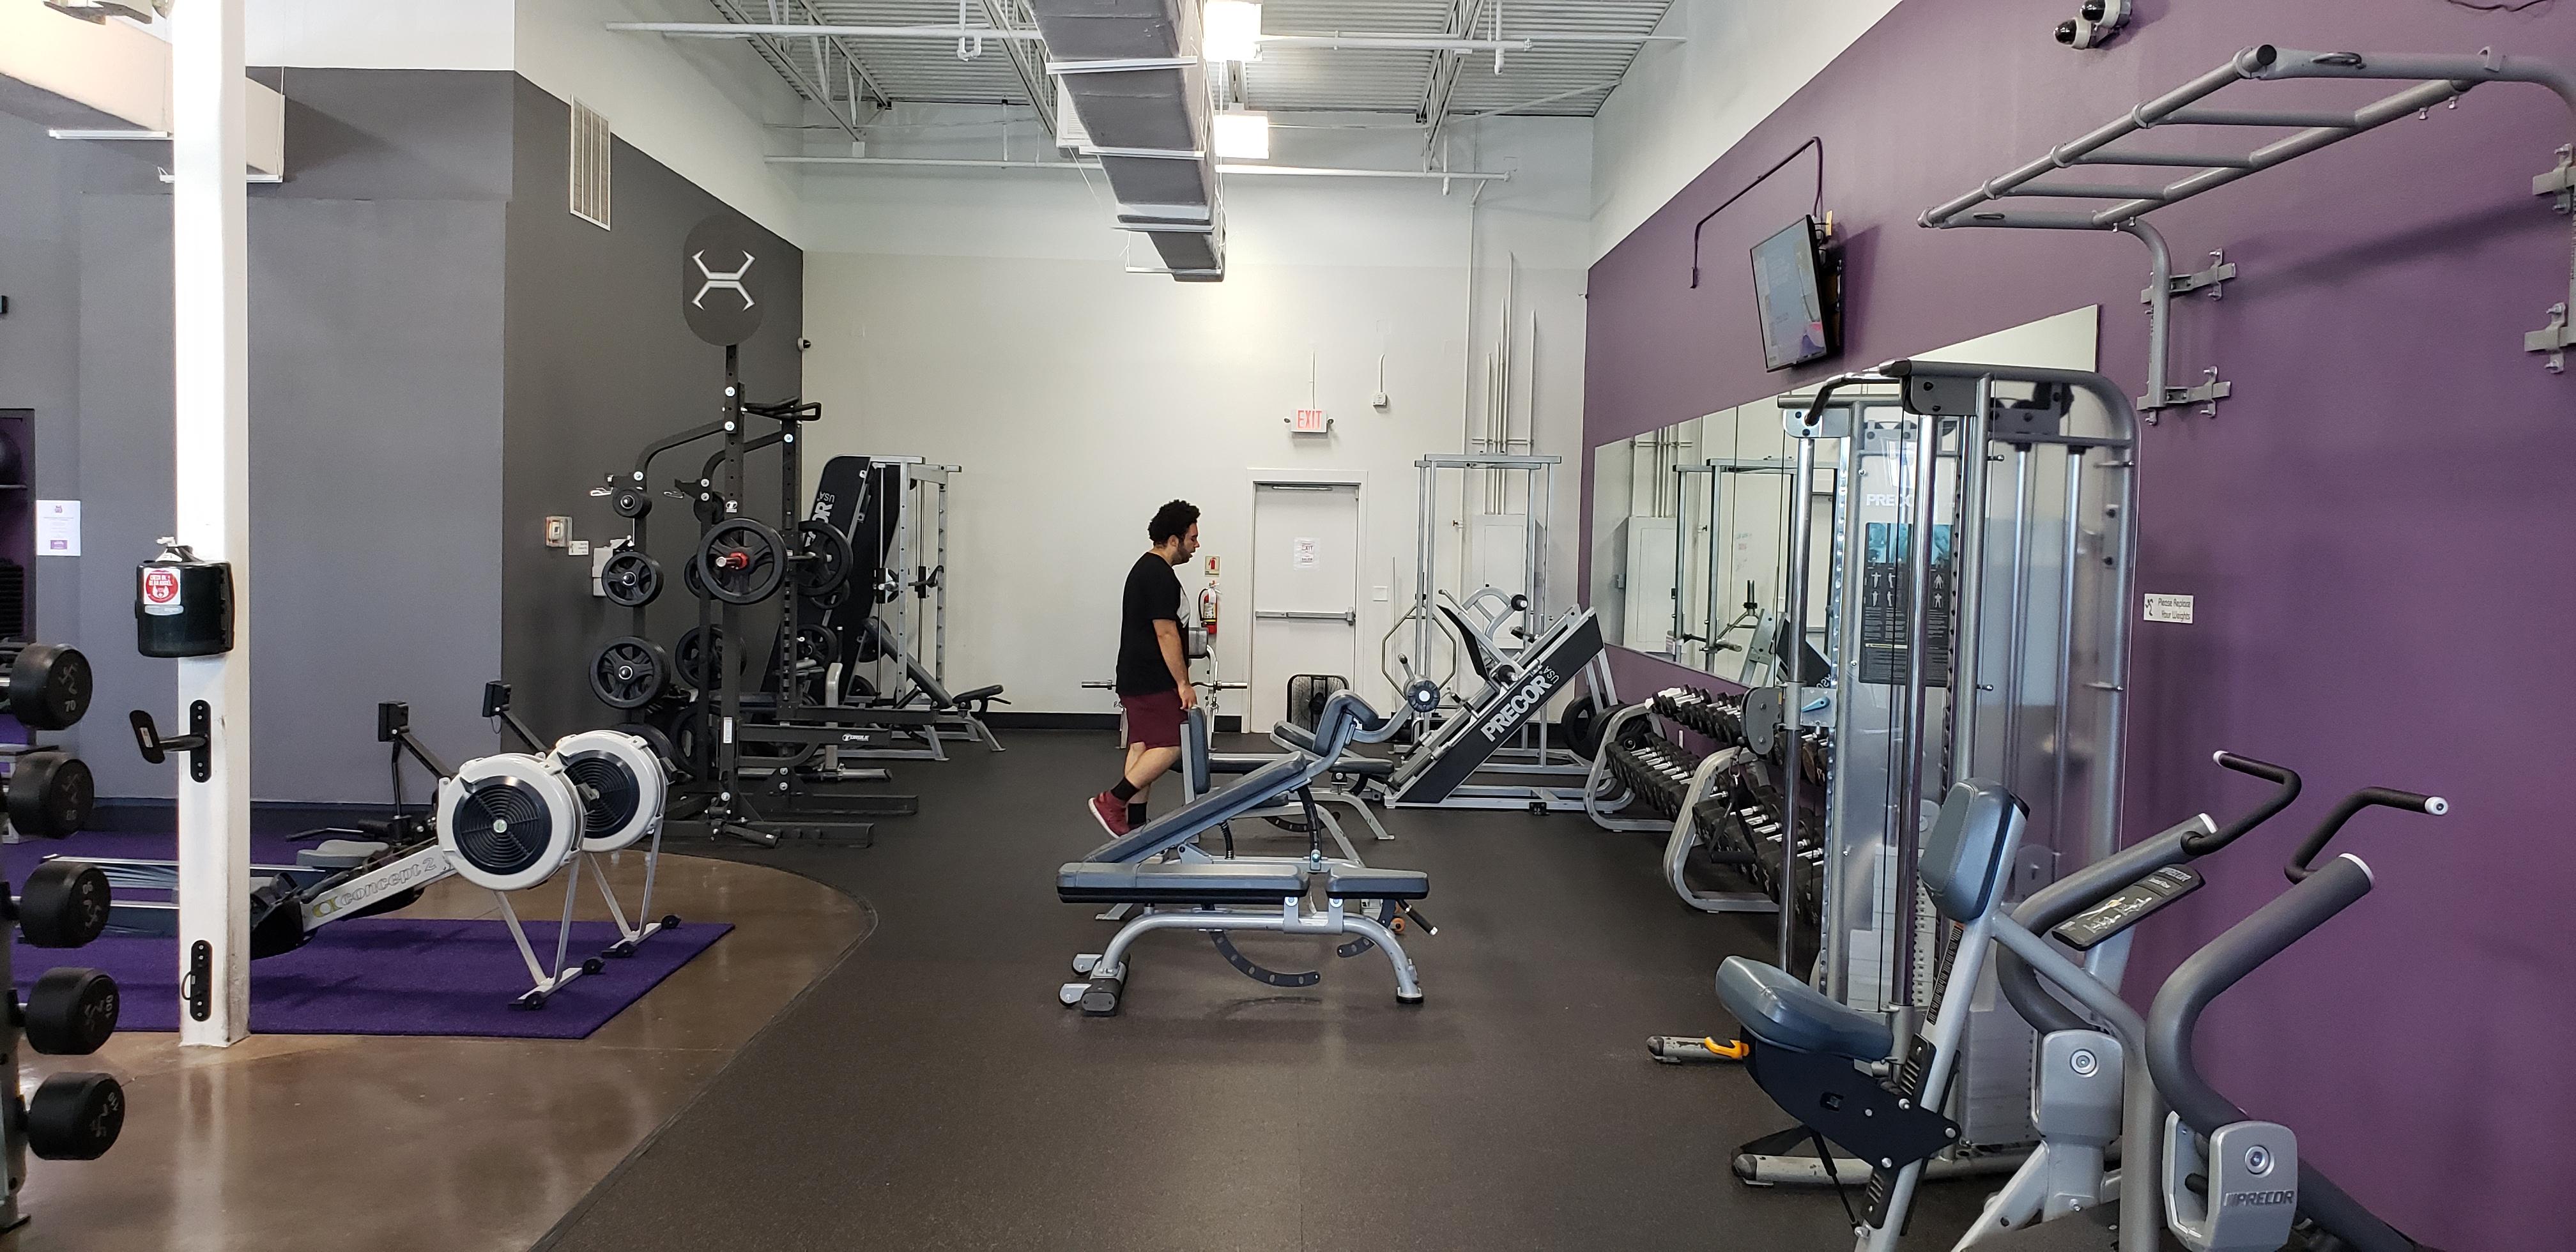 Anytime Fitness 851 S State Road 434 Ste 1220 Altamonte Springs Fl 32714 Yp Com